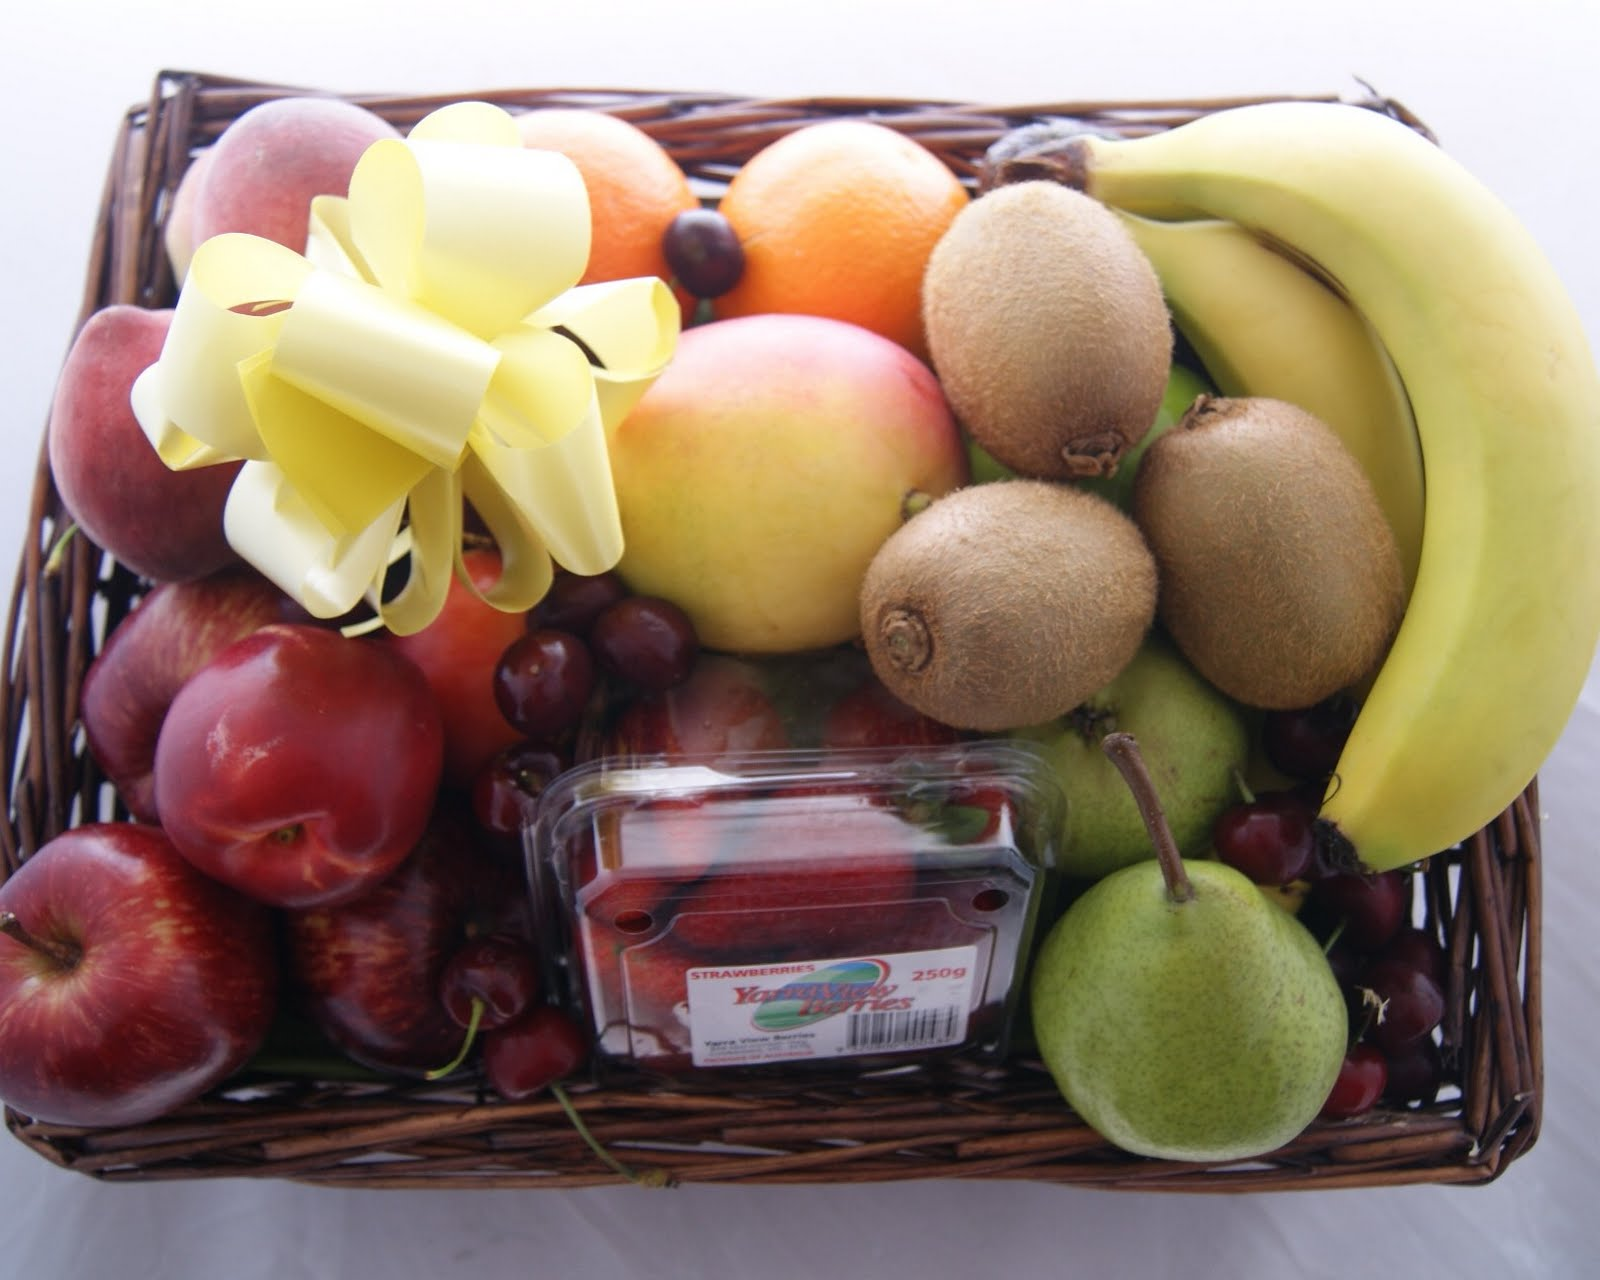 How To Make A Flower Fruit Basket : Gourmet hampers australia happy christmas fruit baskets